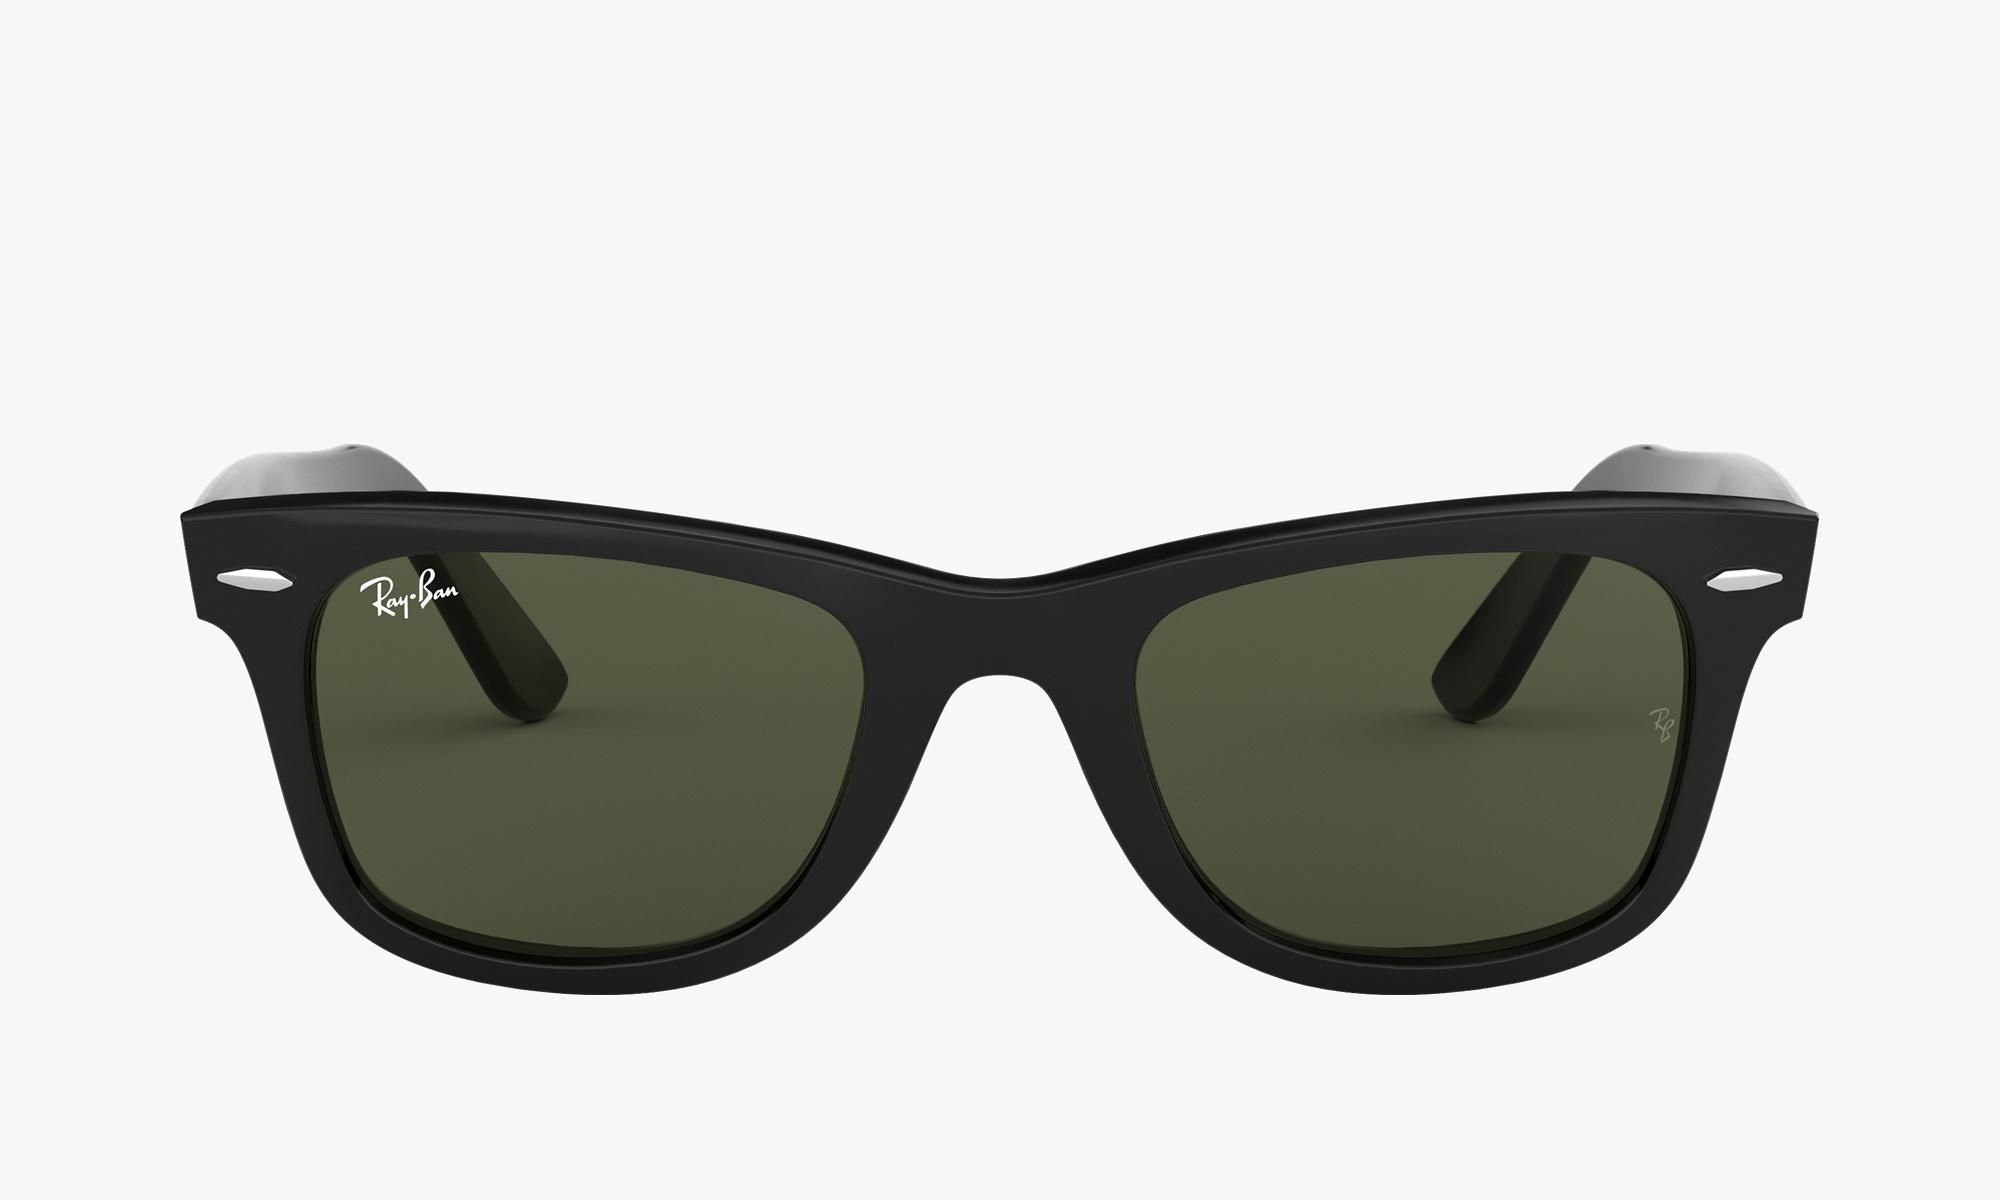 db1361619 Ray-Ban WAYFARER | Glasses.com® | Free Shipping